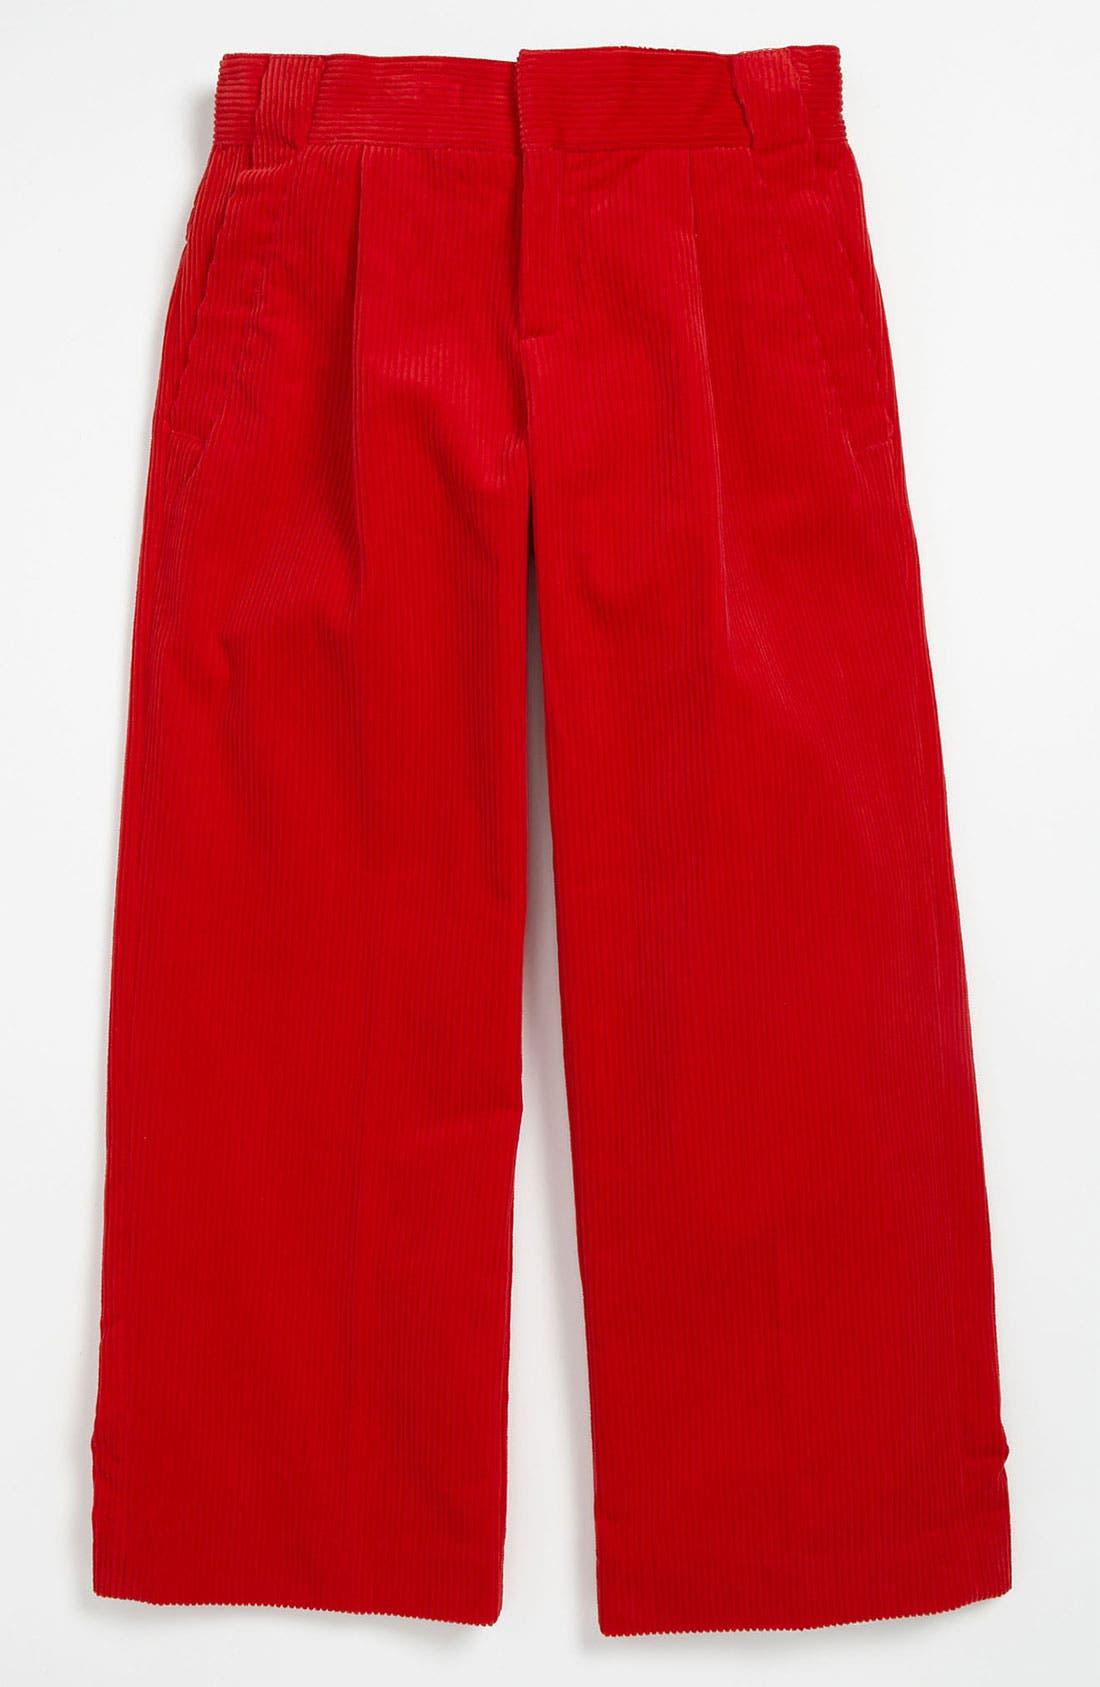 Alternate Image 2  - Marni Corduroy Pants (Little Girls & Big Girls)